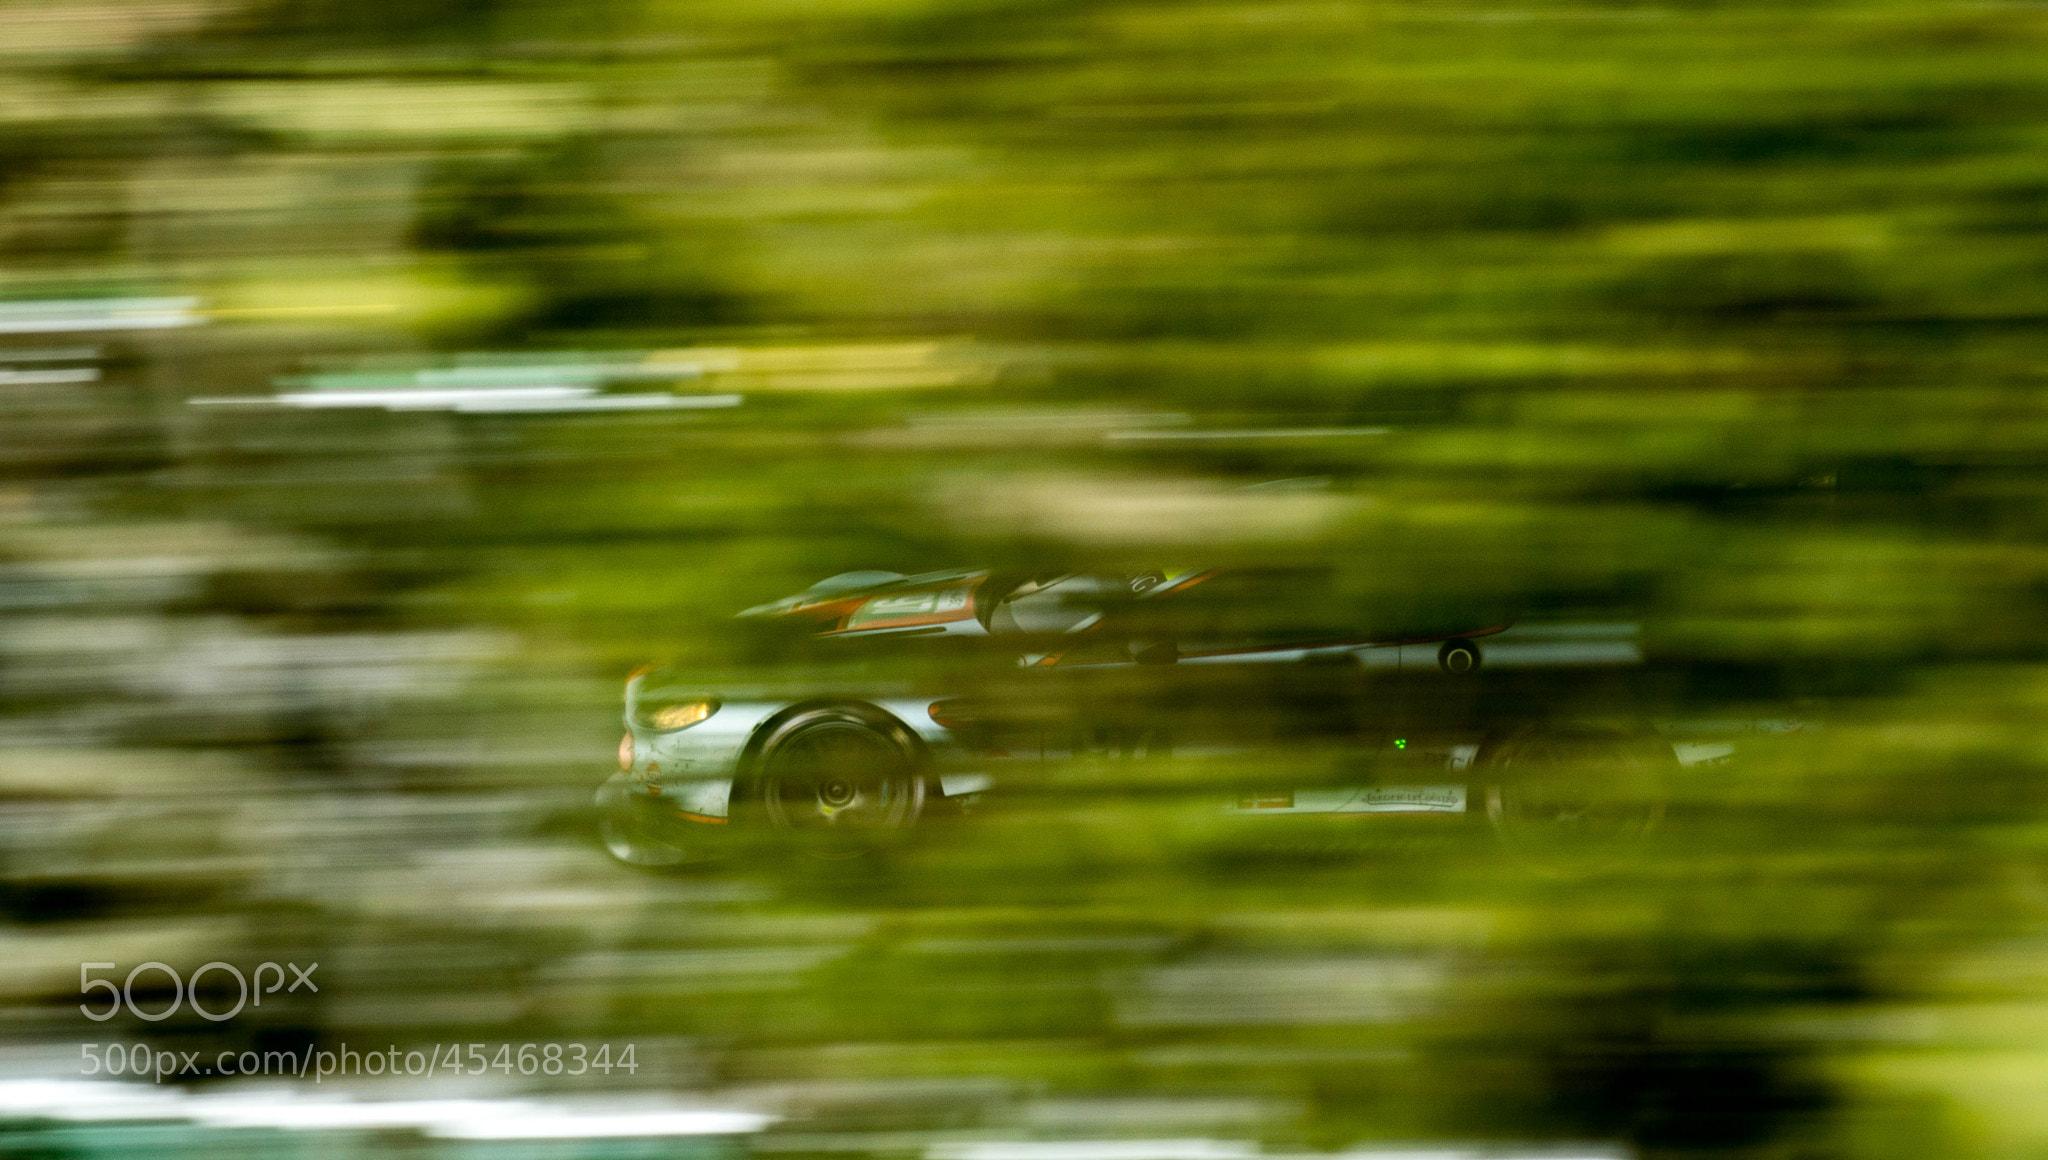 Photograph Aston Martin Racing by Victor Eleutério on 500px